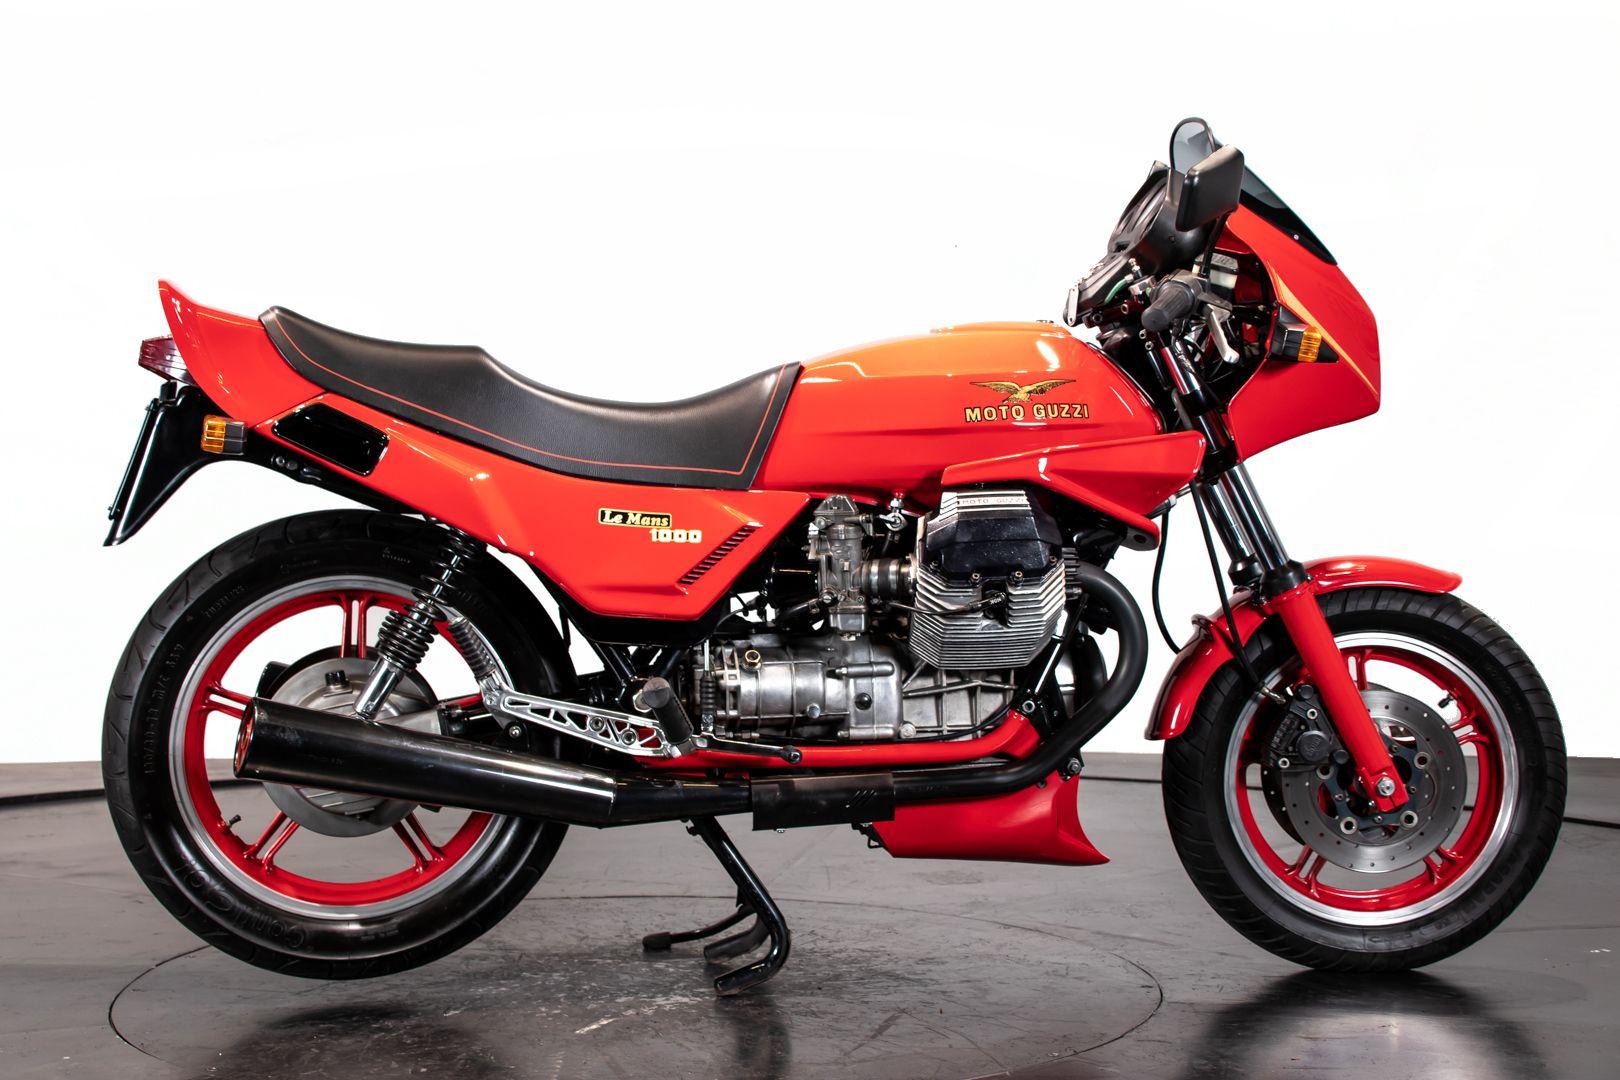 1985 Moto Guzzi le mans 1000 57516